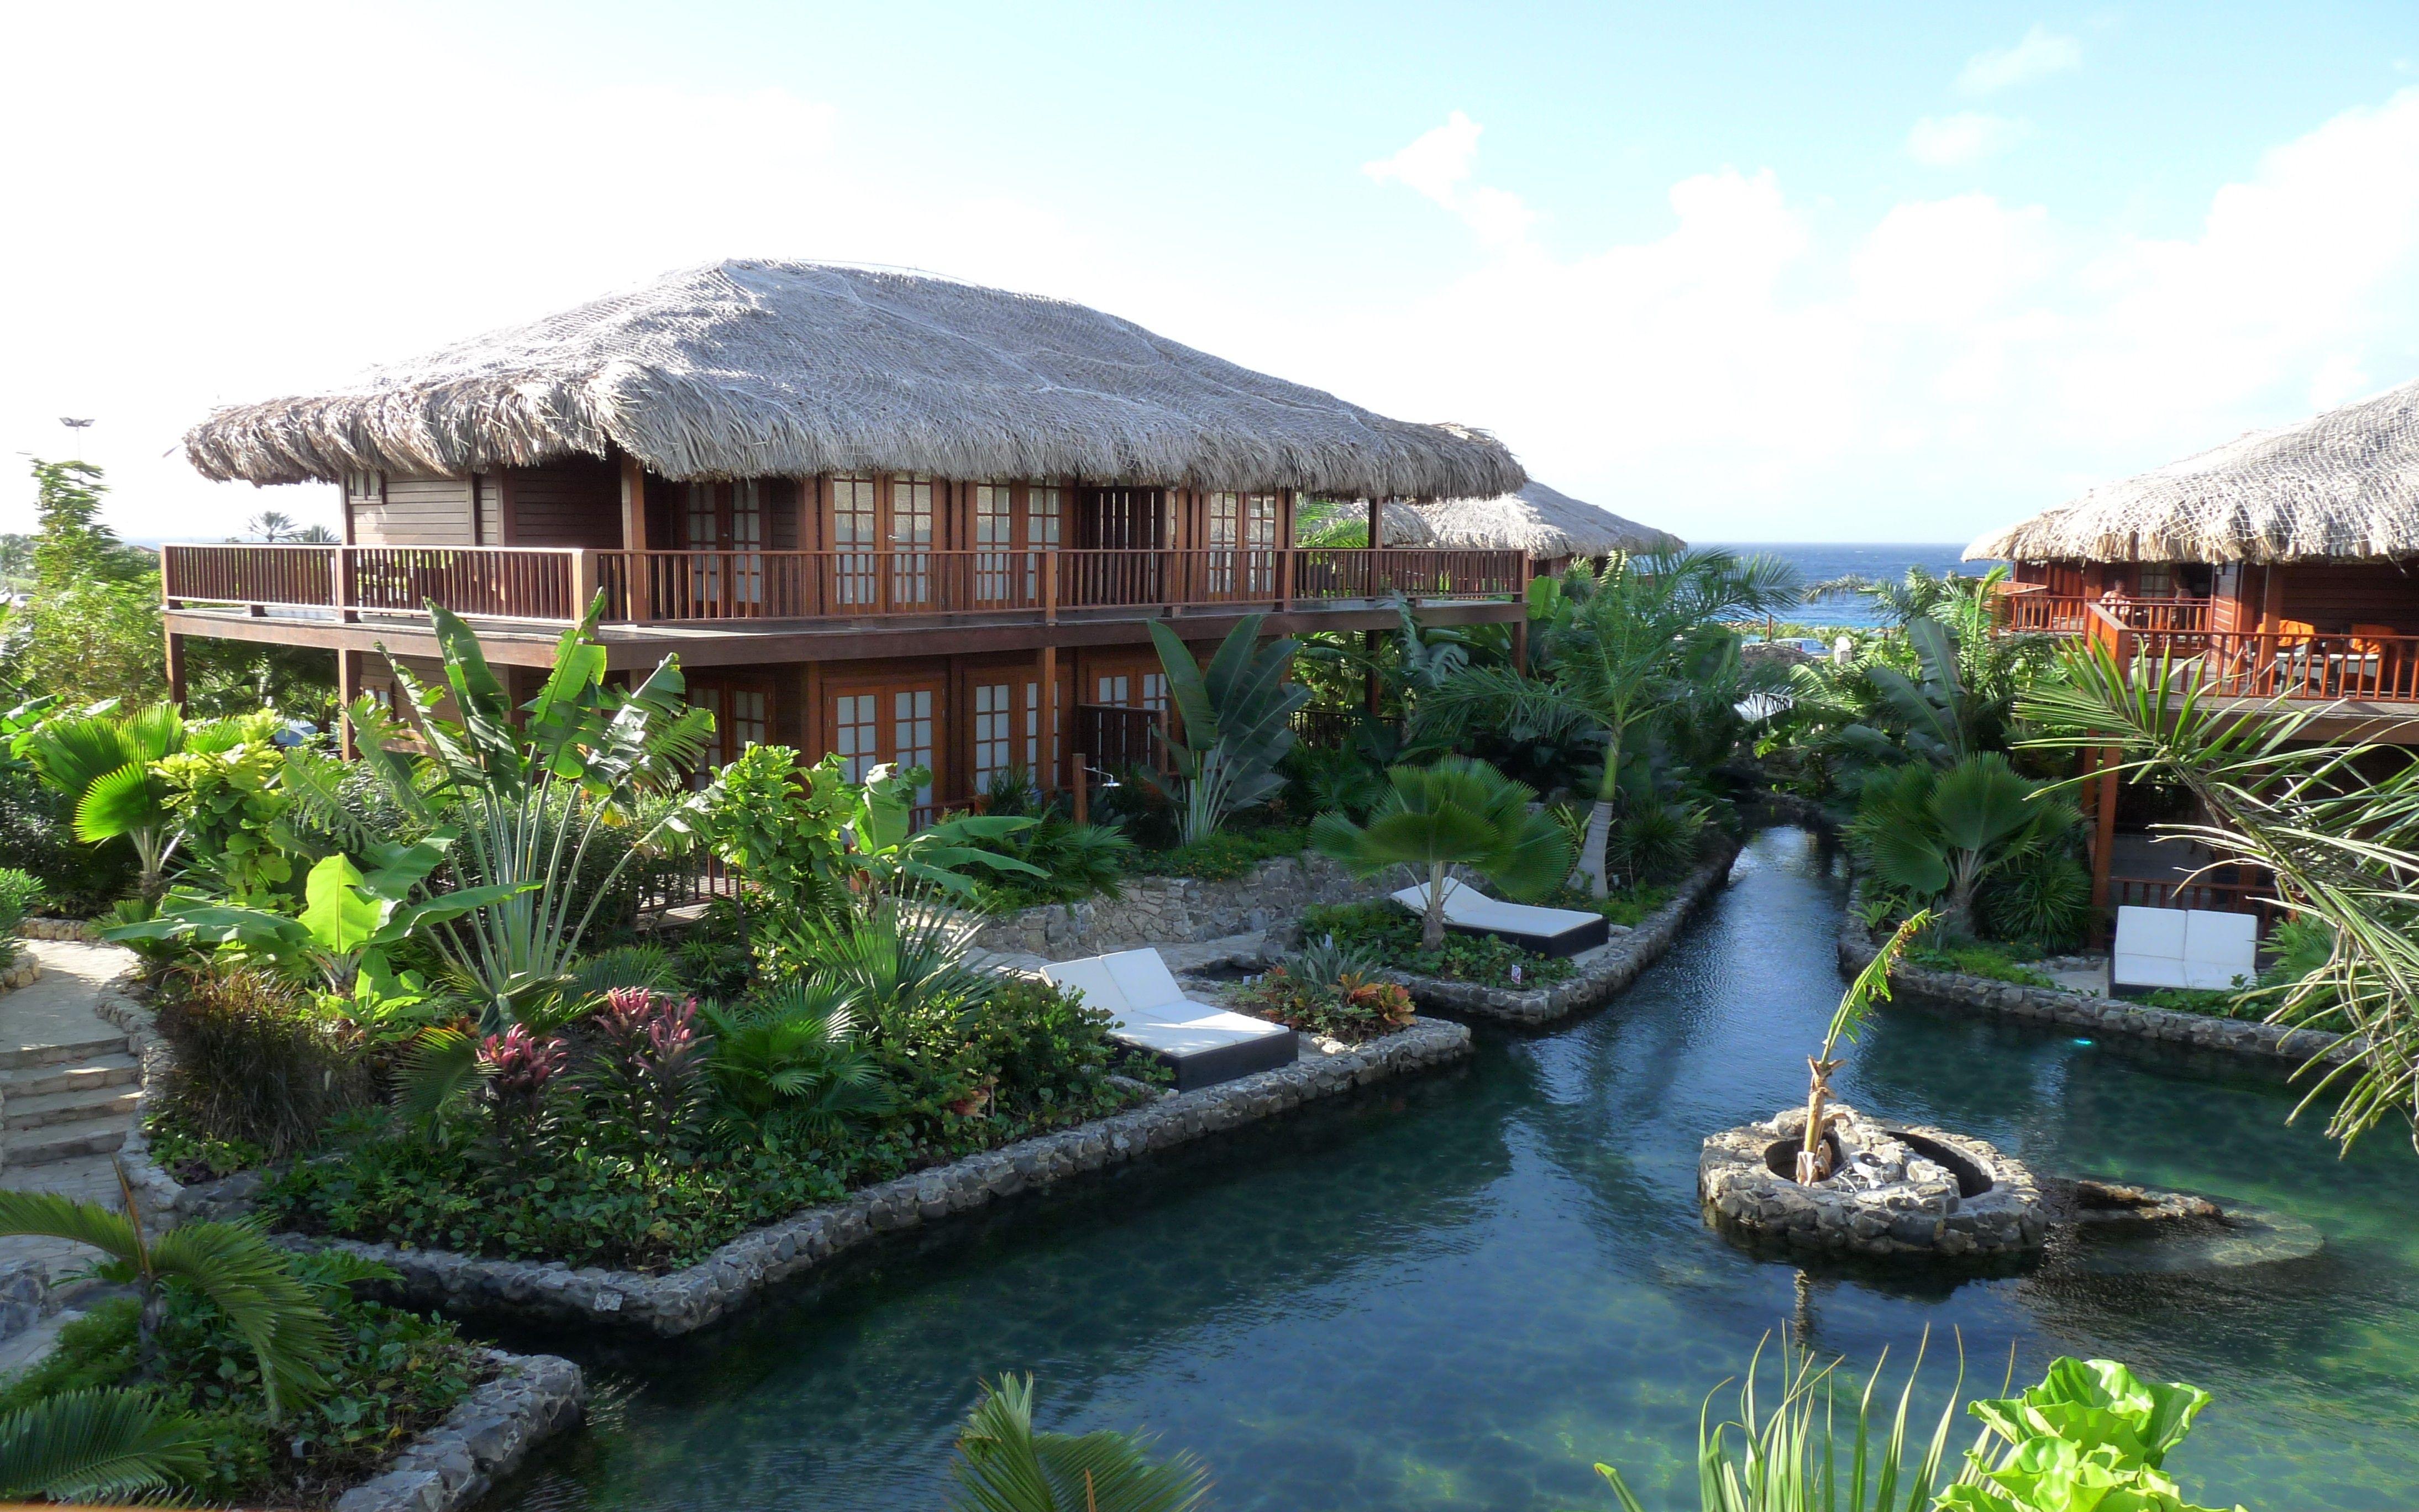 Kontiki beach hotel Van der Valk - Curacao | Curacao | Pinterest ...